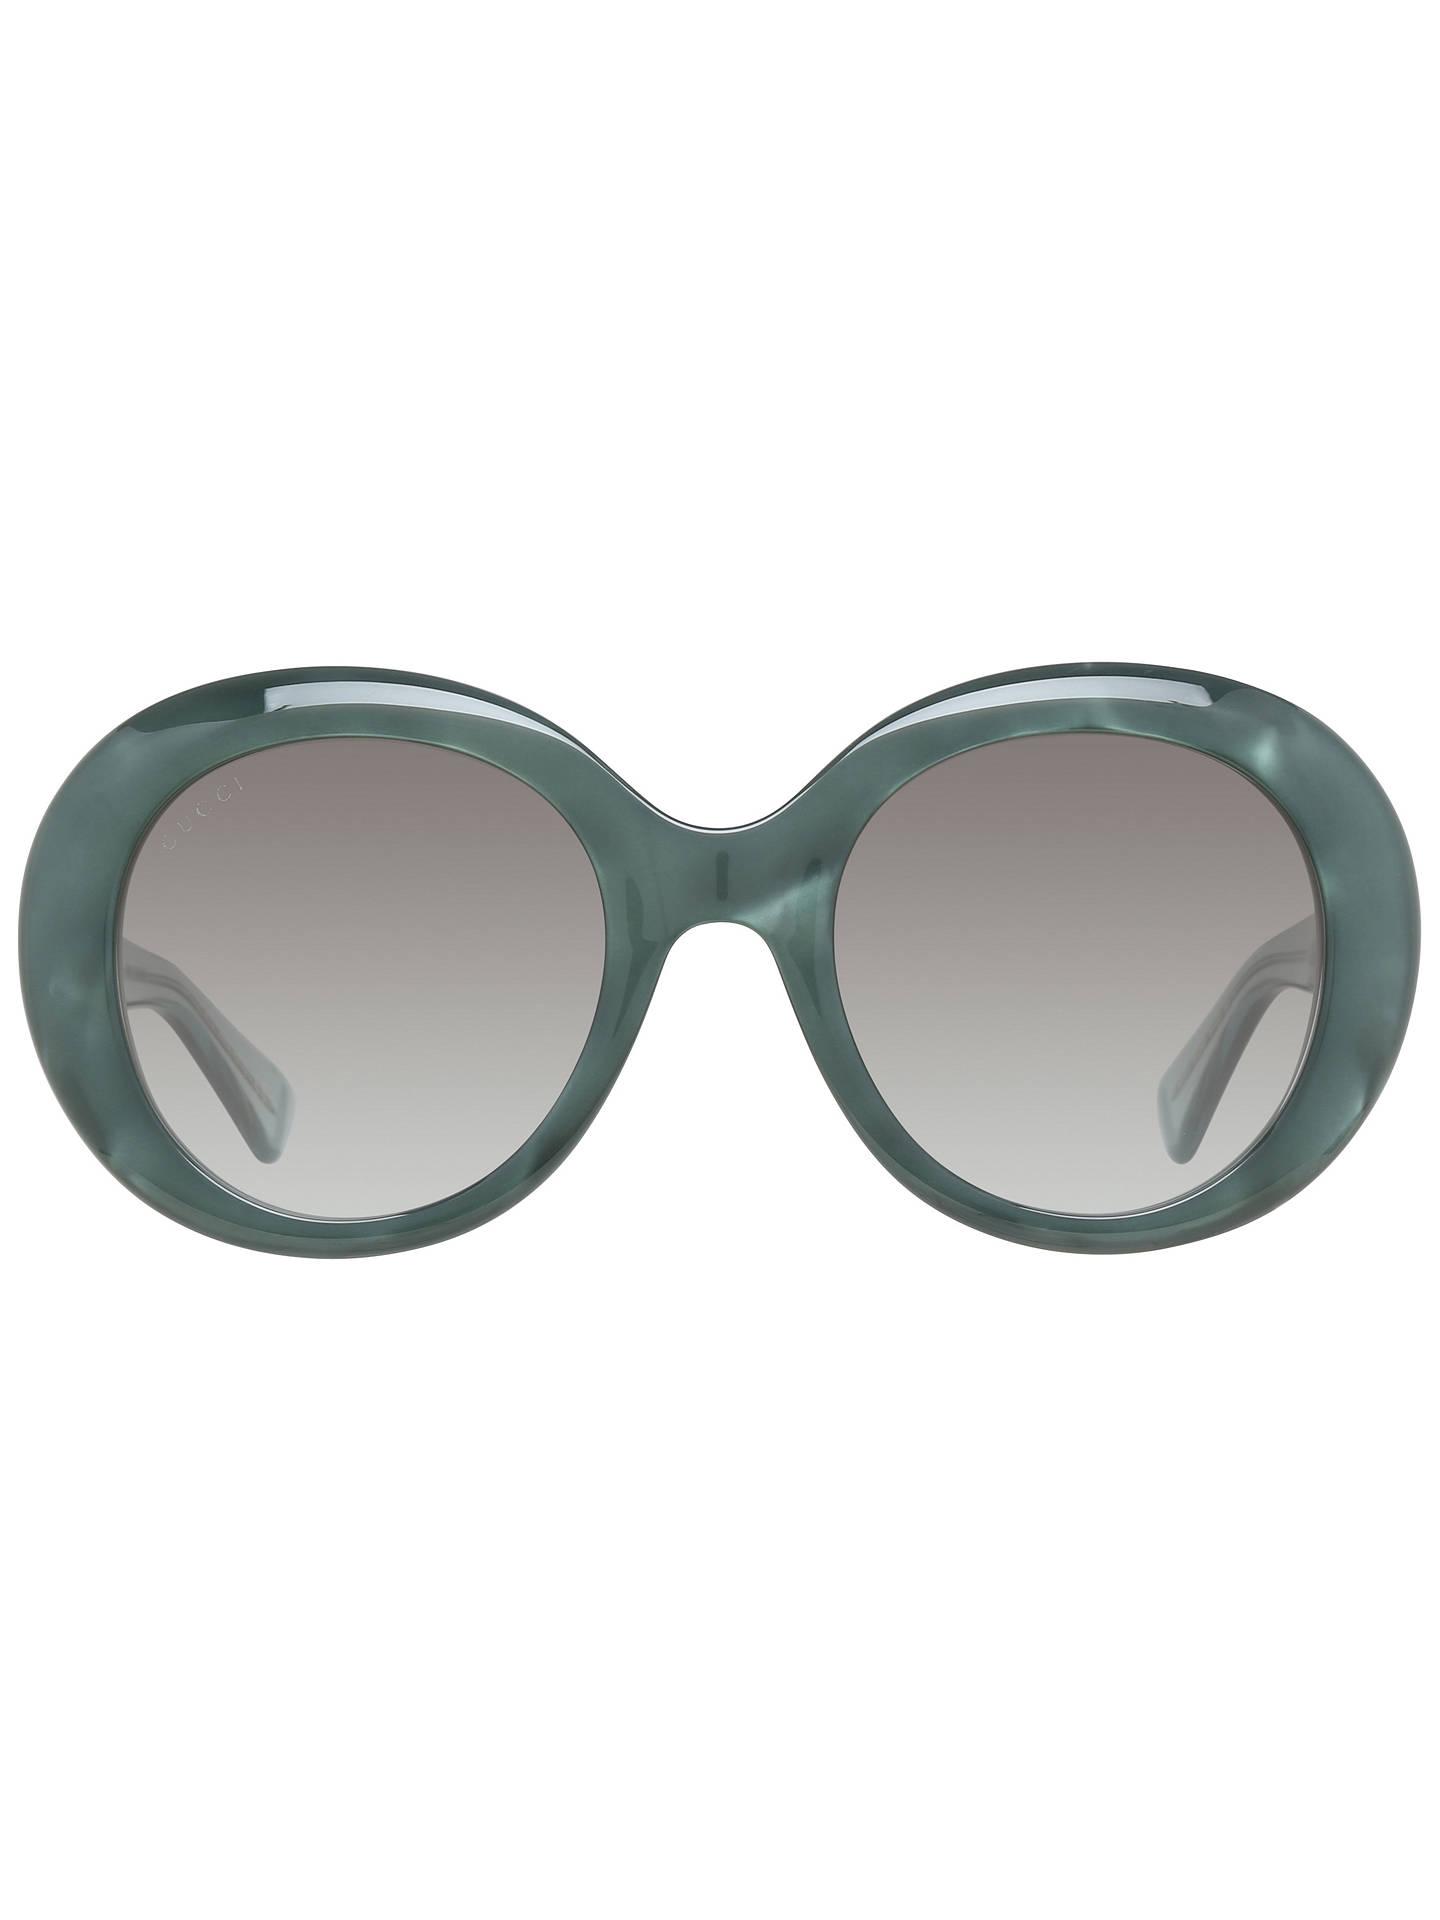 12767f53dacb1 ... Buy Gucci GG 3815 S Round Sunglasses